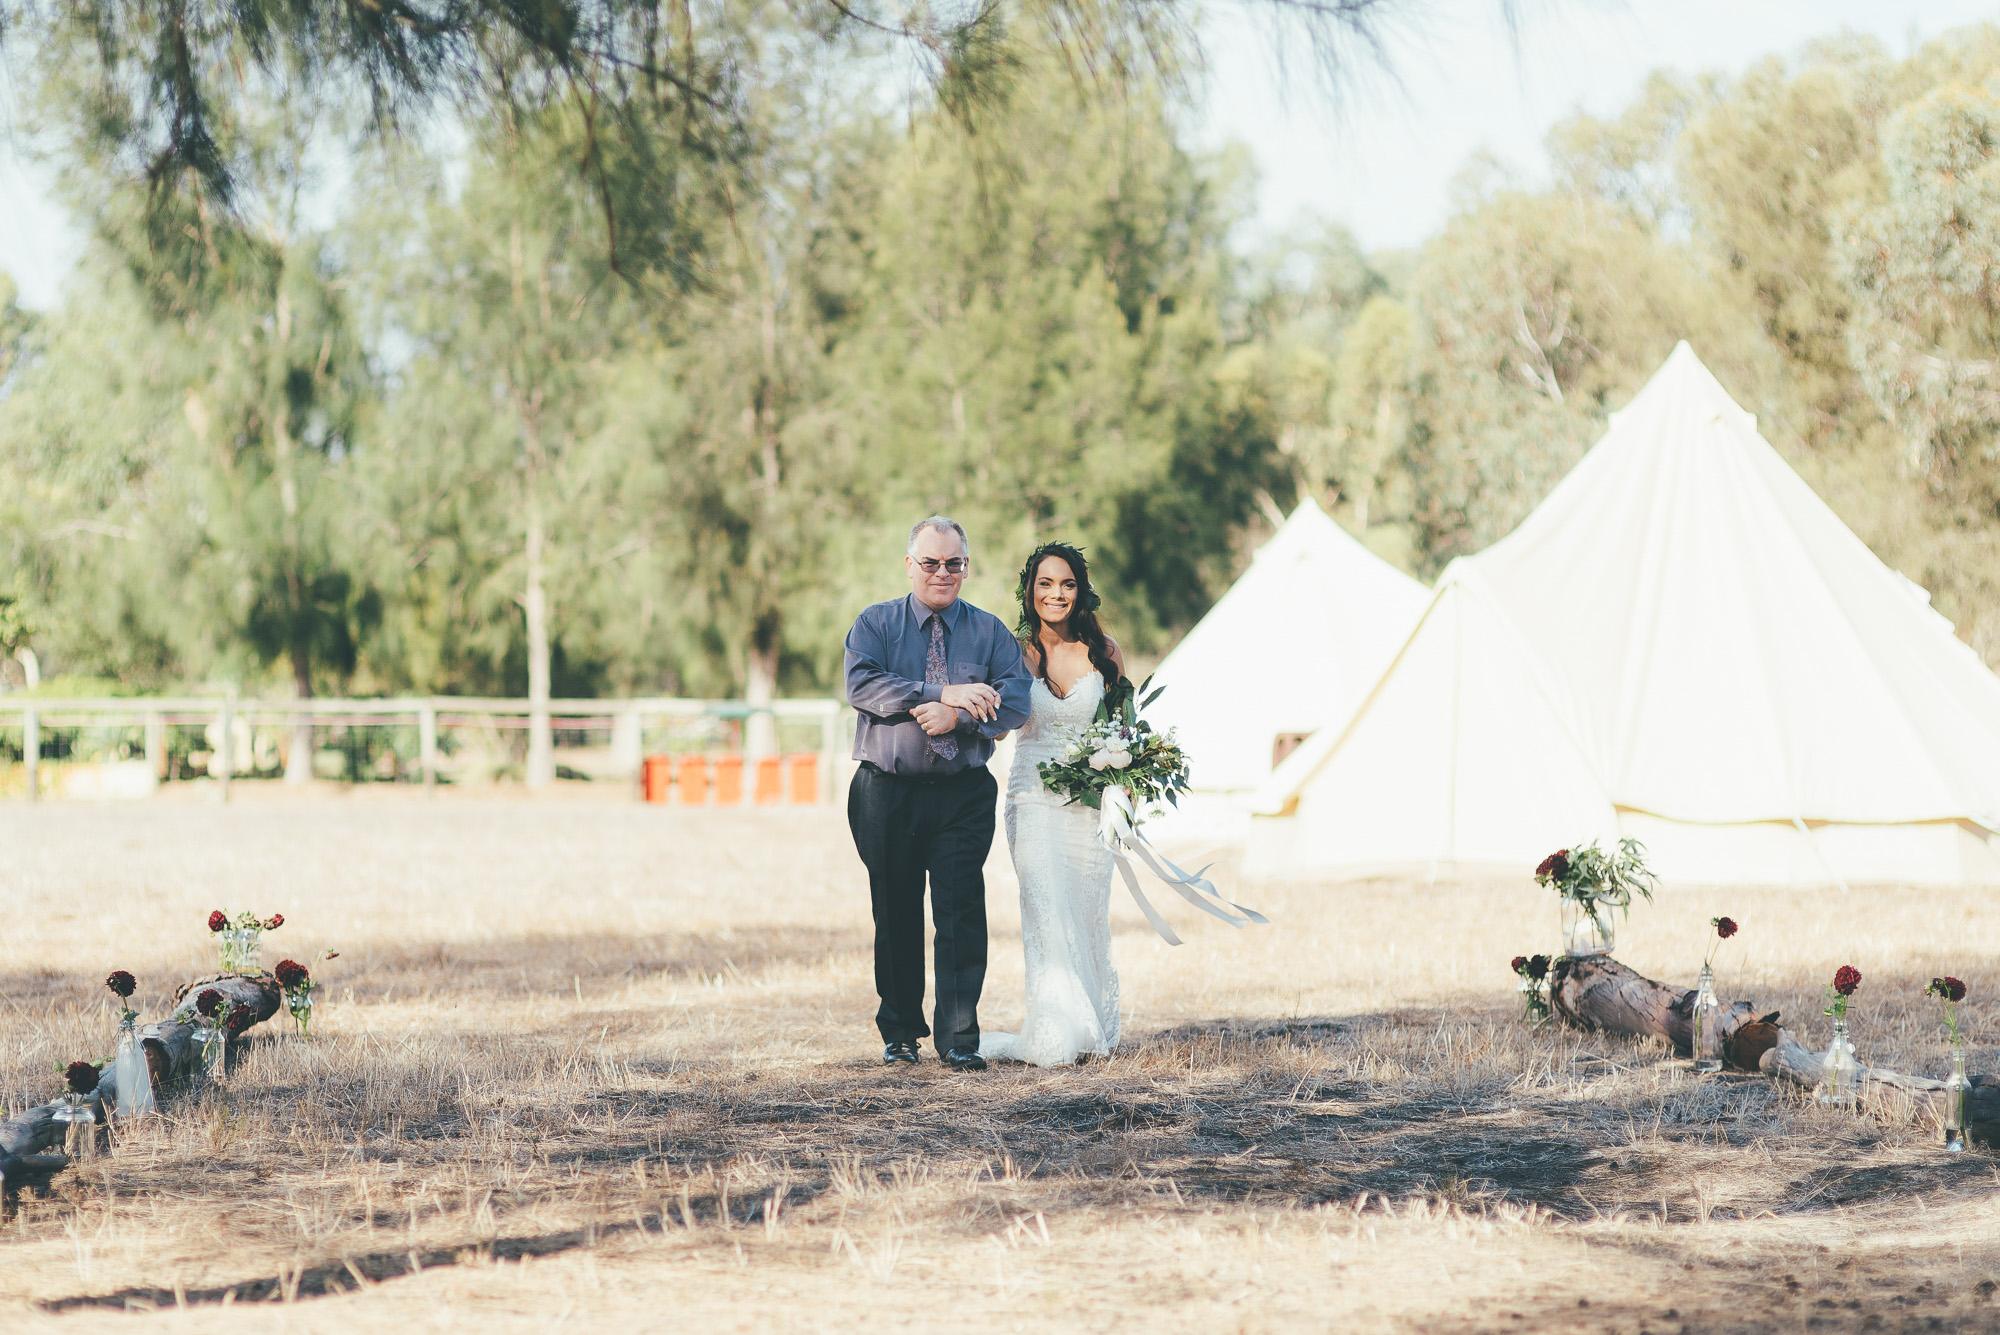 wedding-photographer-outdoor-casual-styled-los-angeles-australia-california-international-earthbound -29.jpg